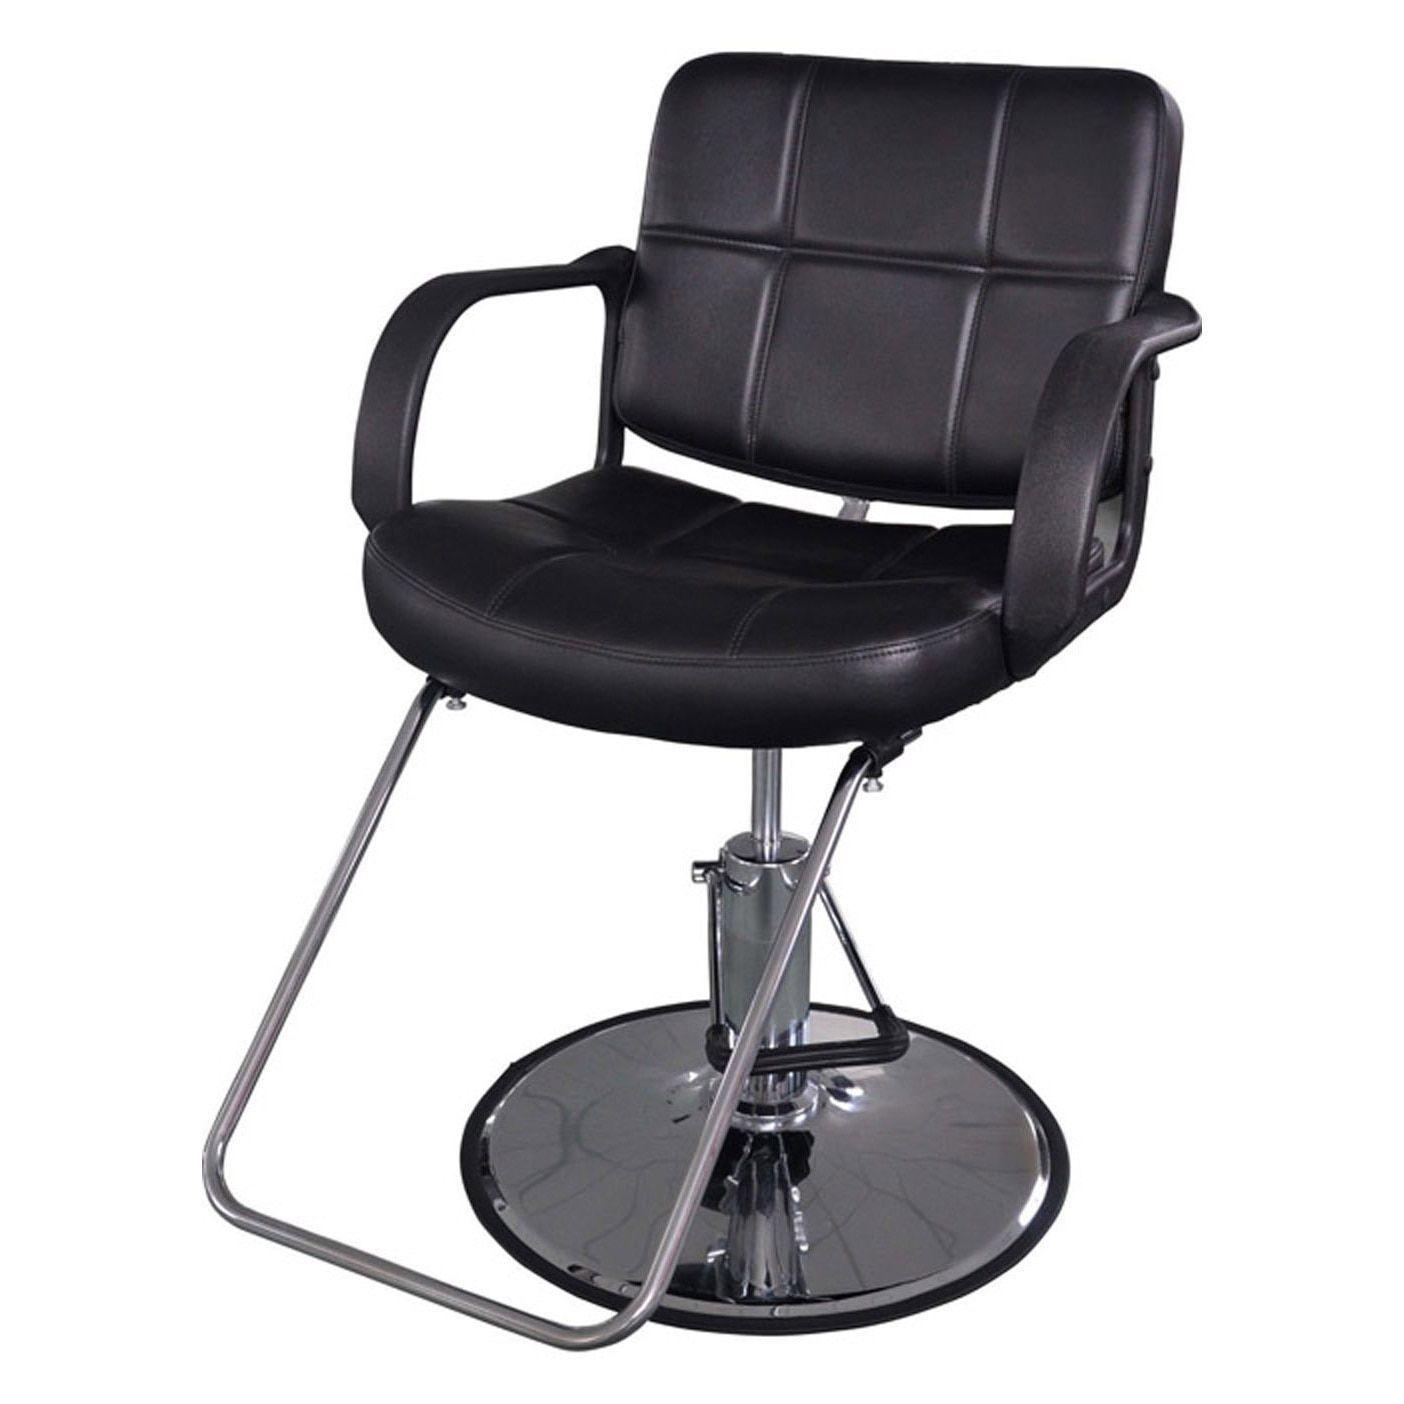 Charmant BarberPub Classic Hydraulic Hair Salon Chair